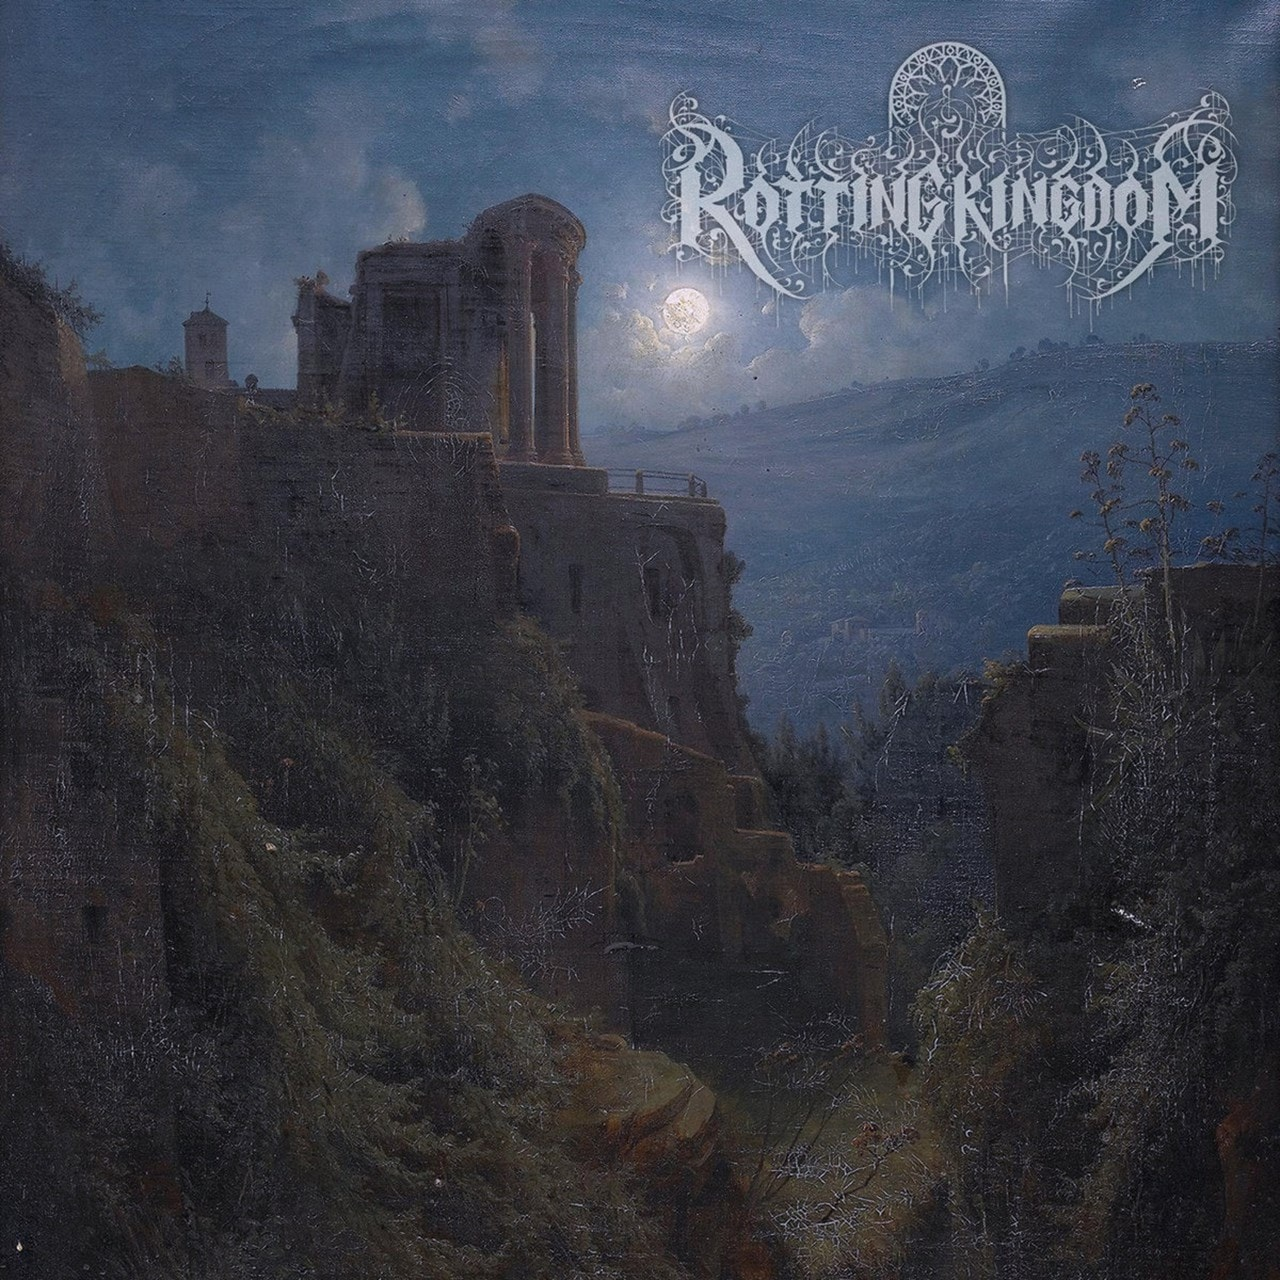 Rotting Kingdom - 1